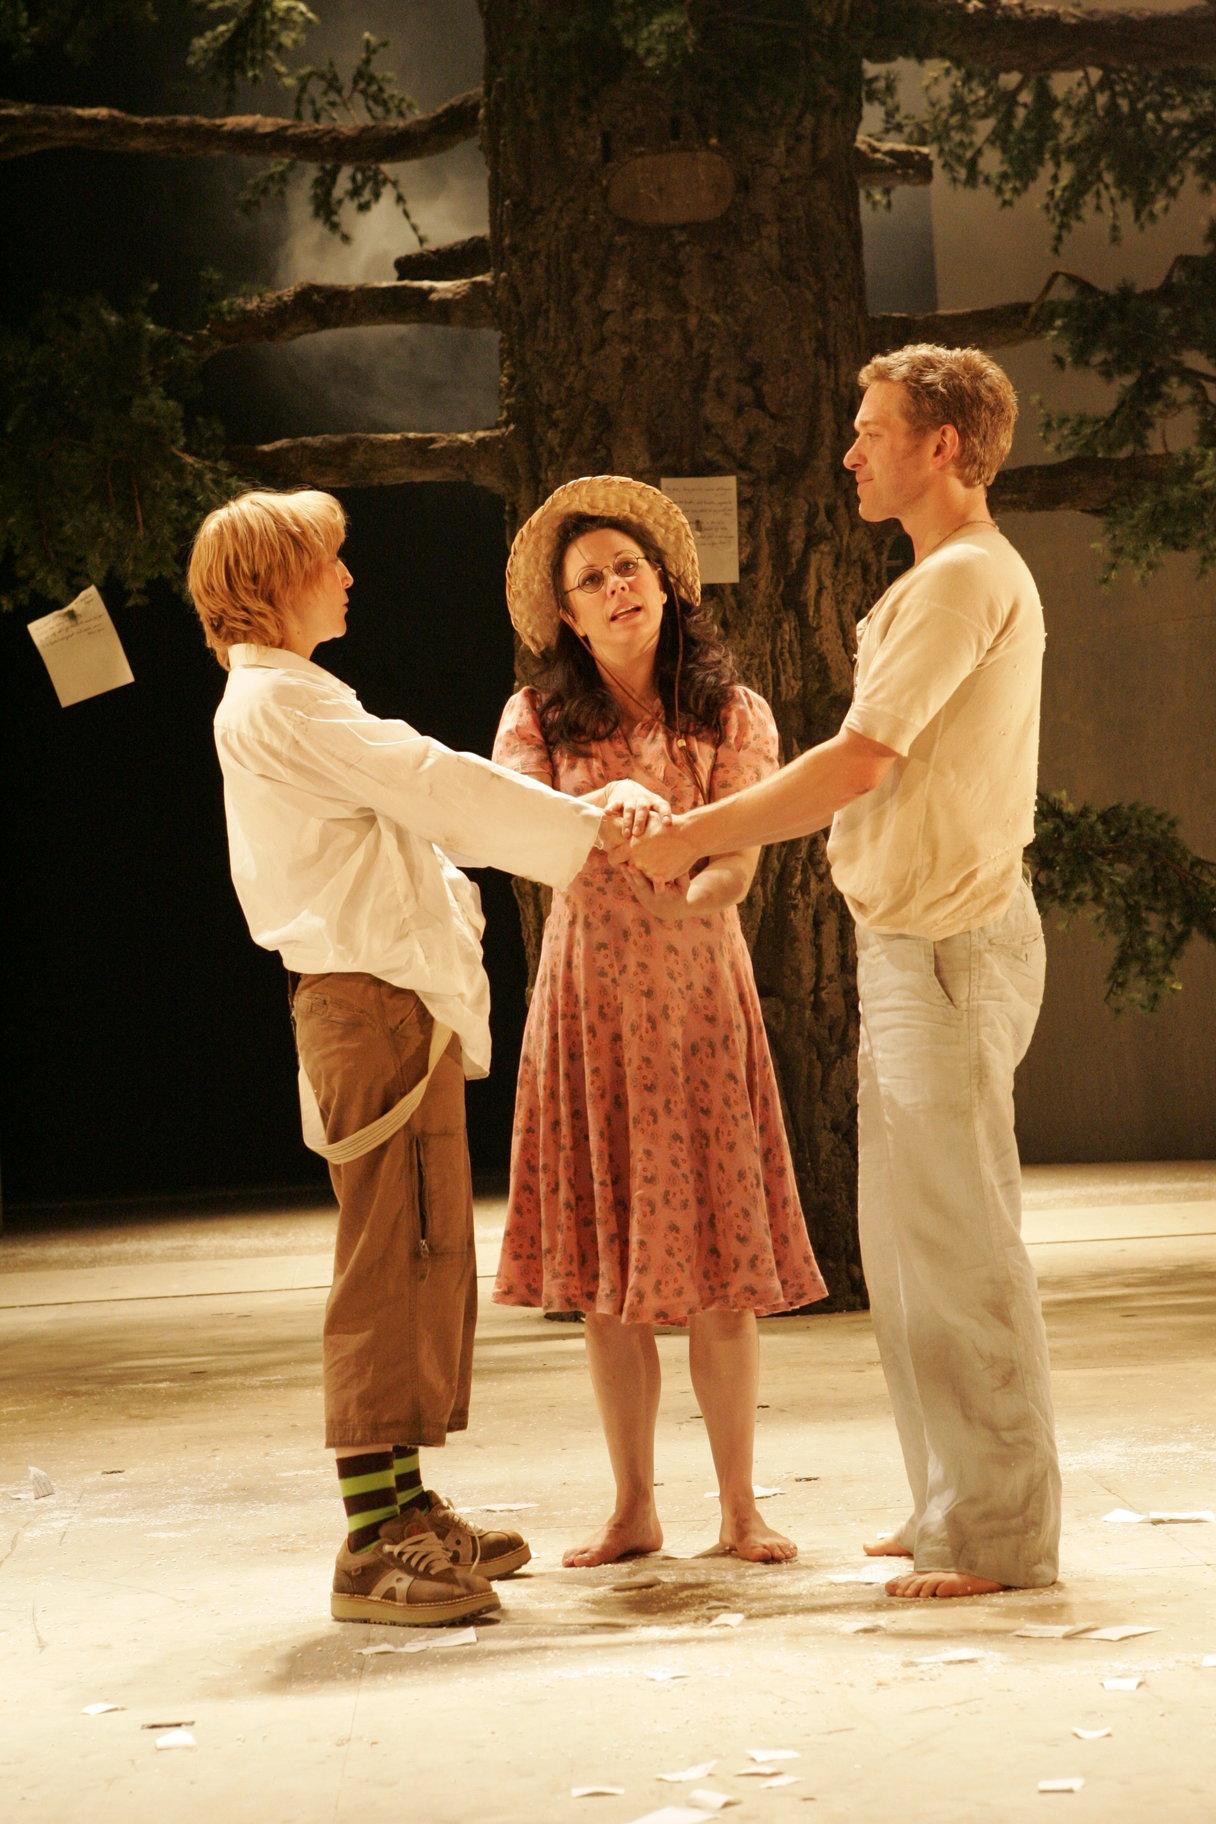 Celia marries Ganymede and Orlando.